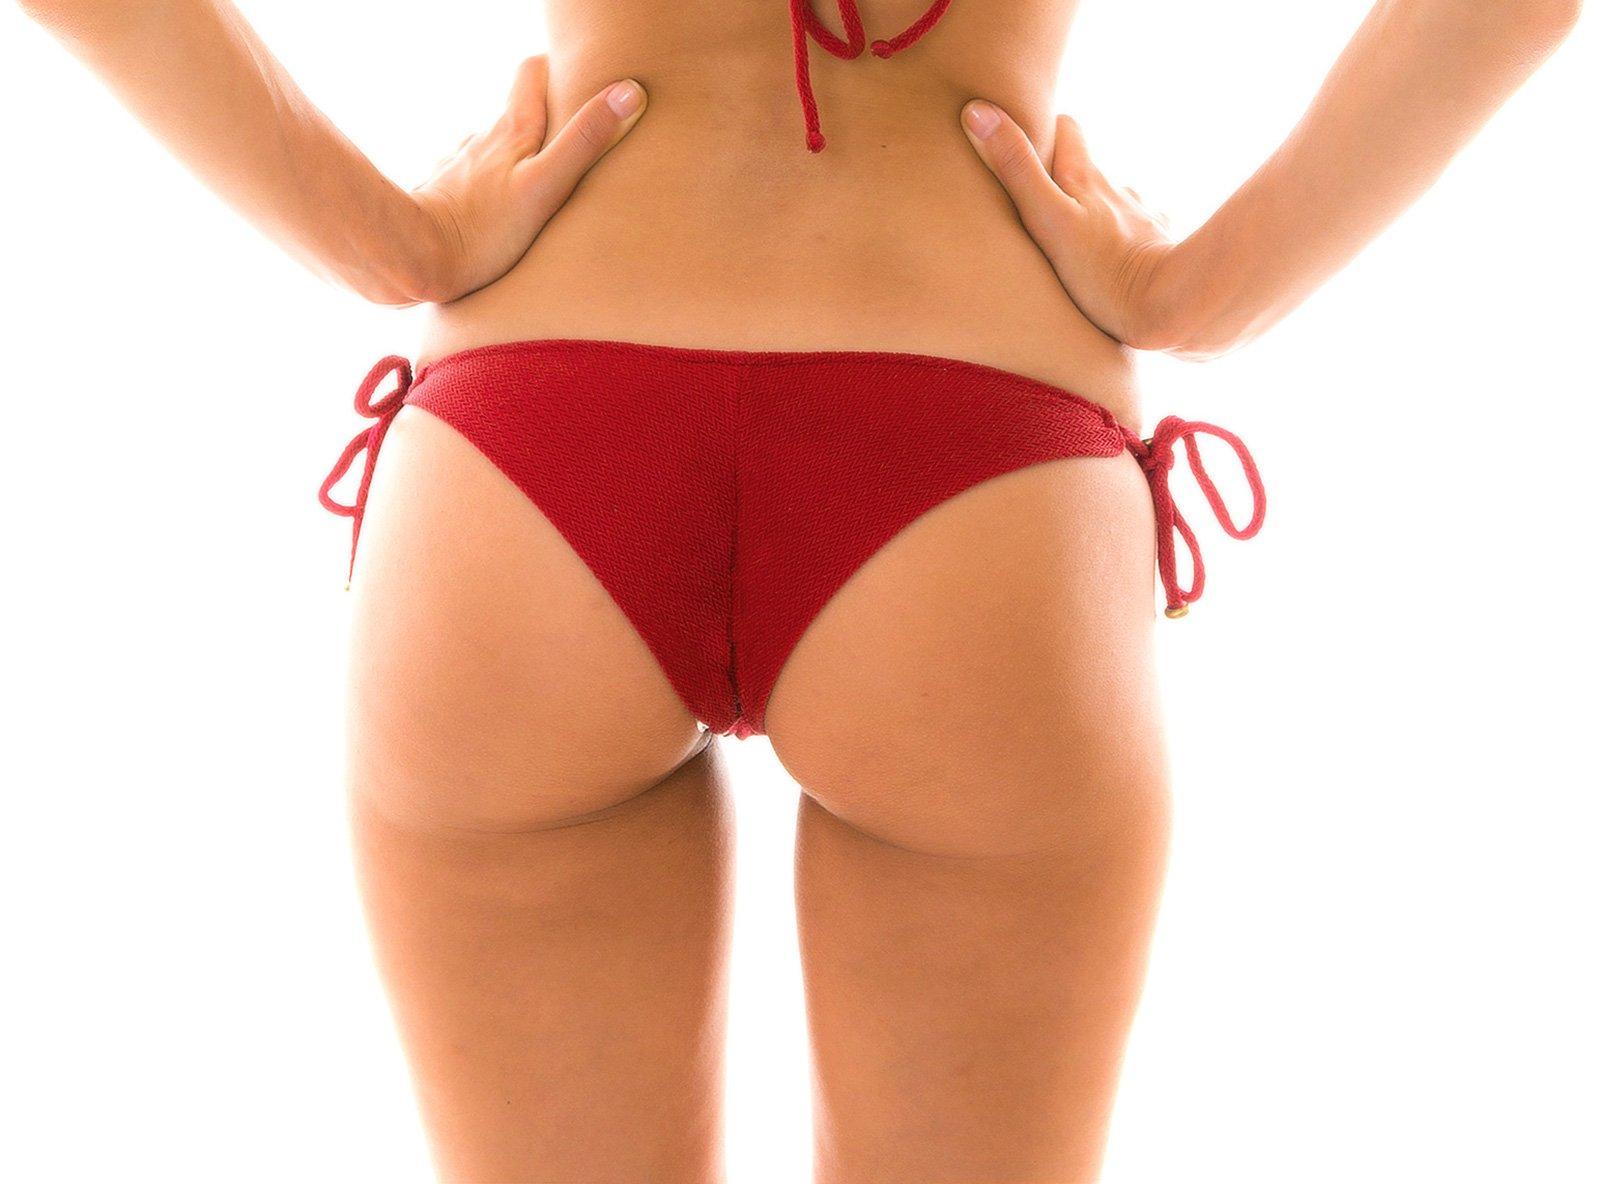 abb9f31550 ... Textured and accessorized deep red bikini bottom - BOTTOM DUNA TRI  DIVINO ...